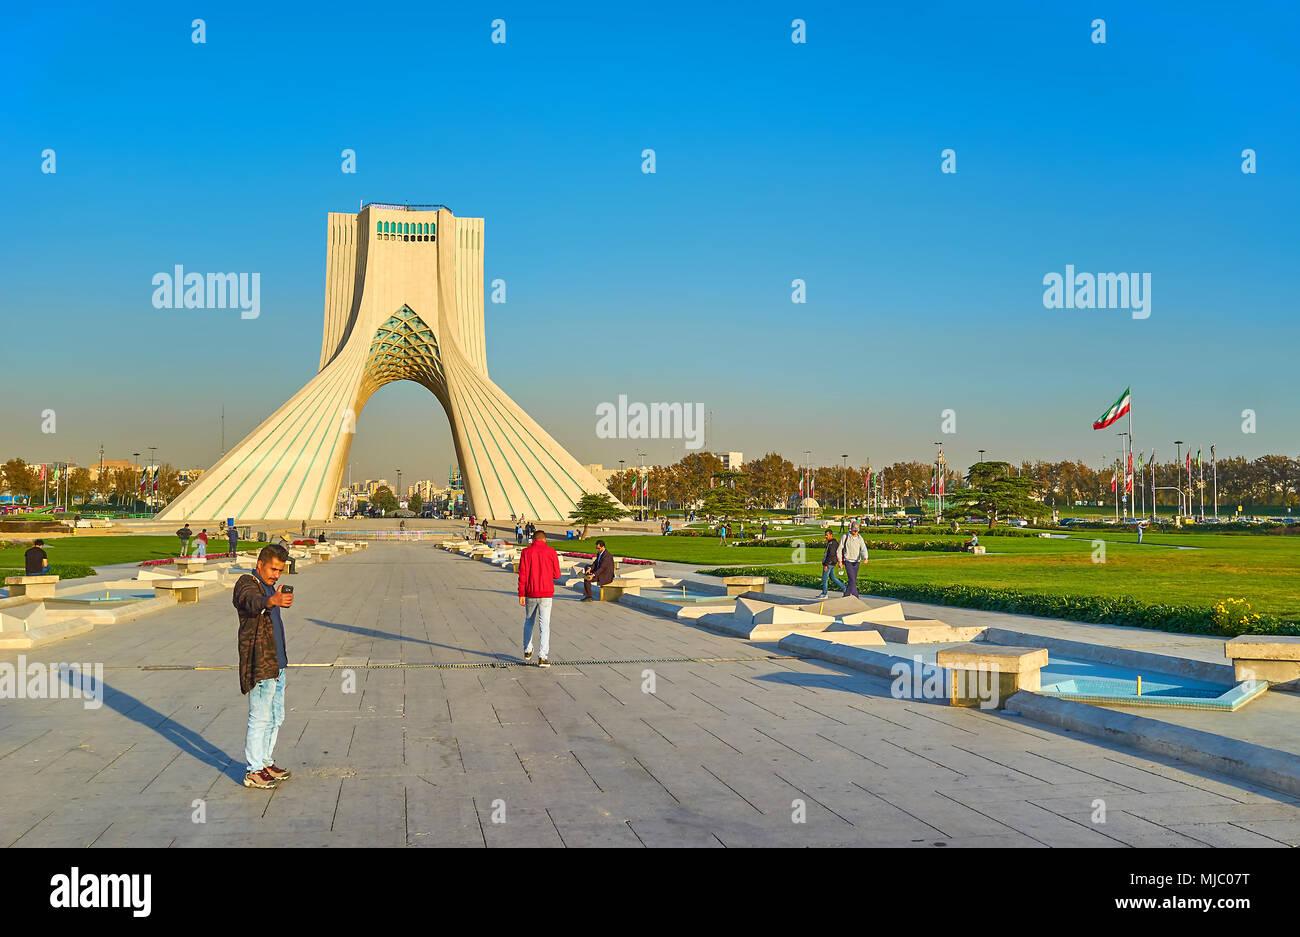 Tehran place 1 part 24 investments siim kallas nortal investments